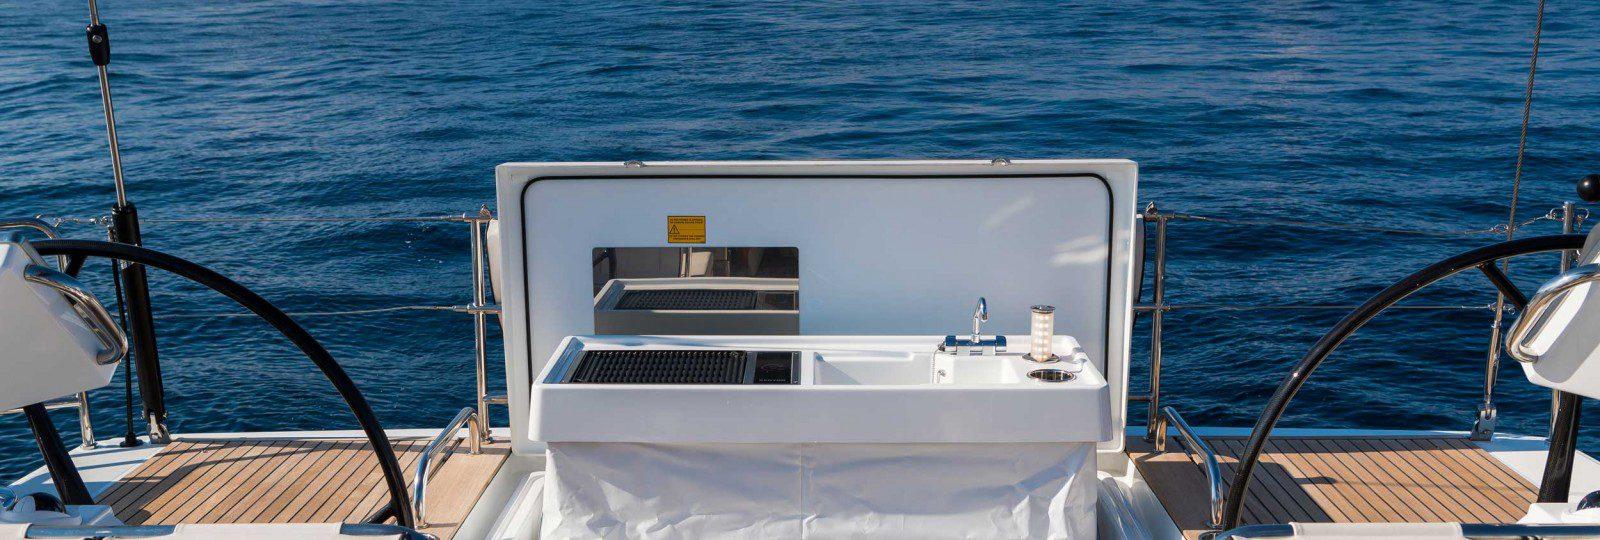 Oceanis Yacht 62 BBQ